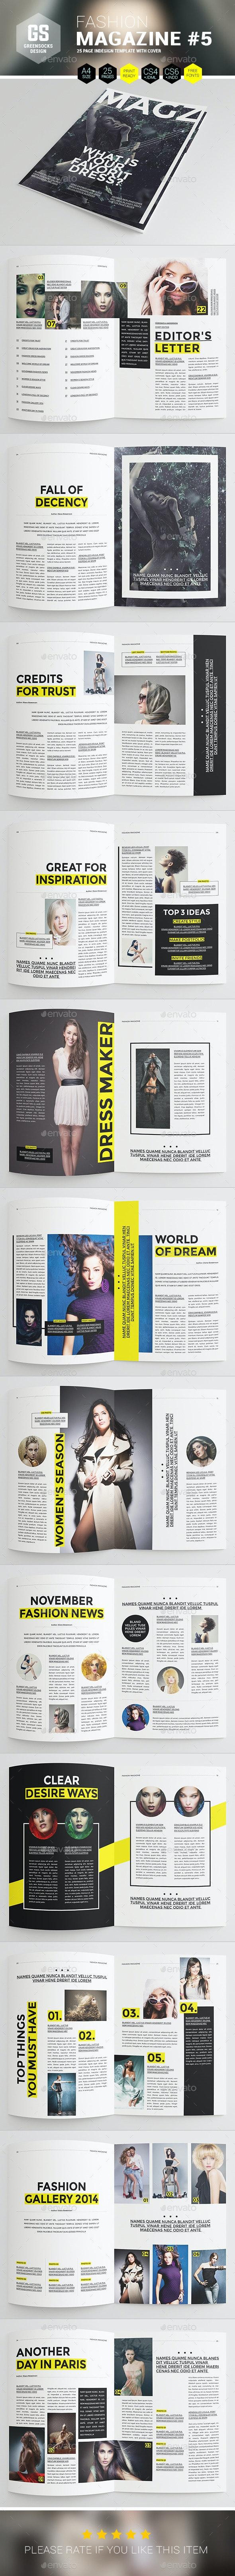 Fashion Magazine #5 - Magazines Print Templates